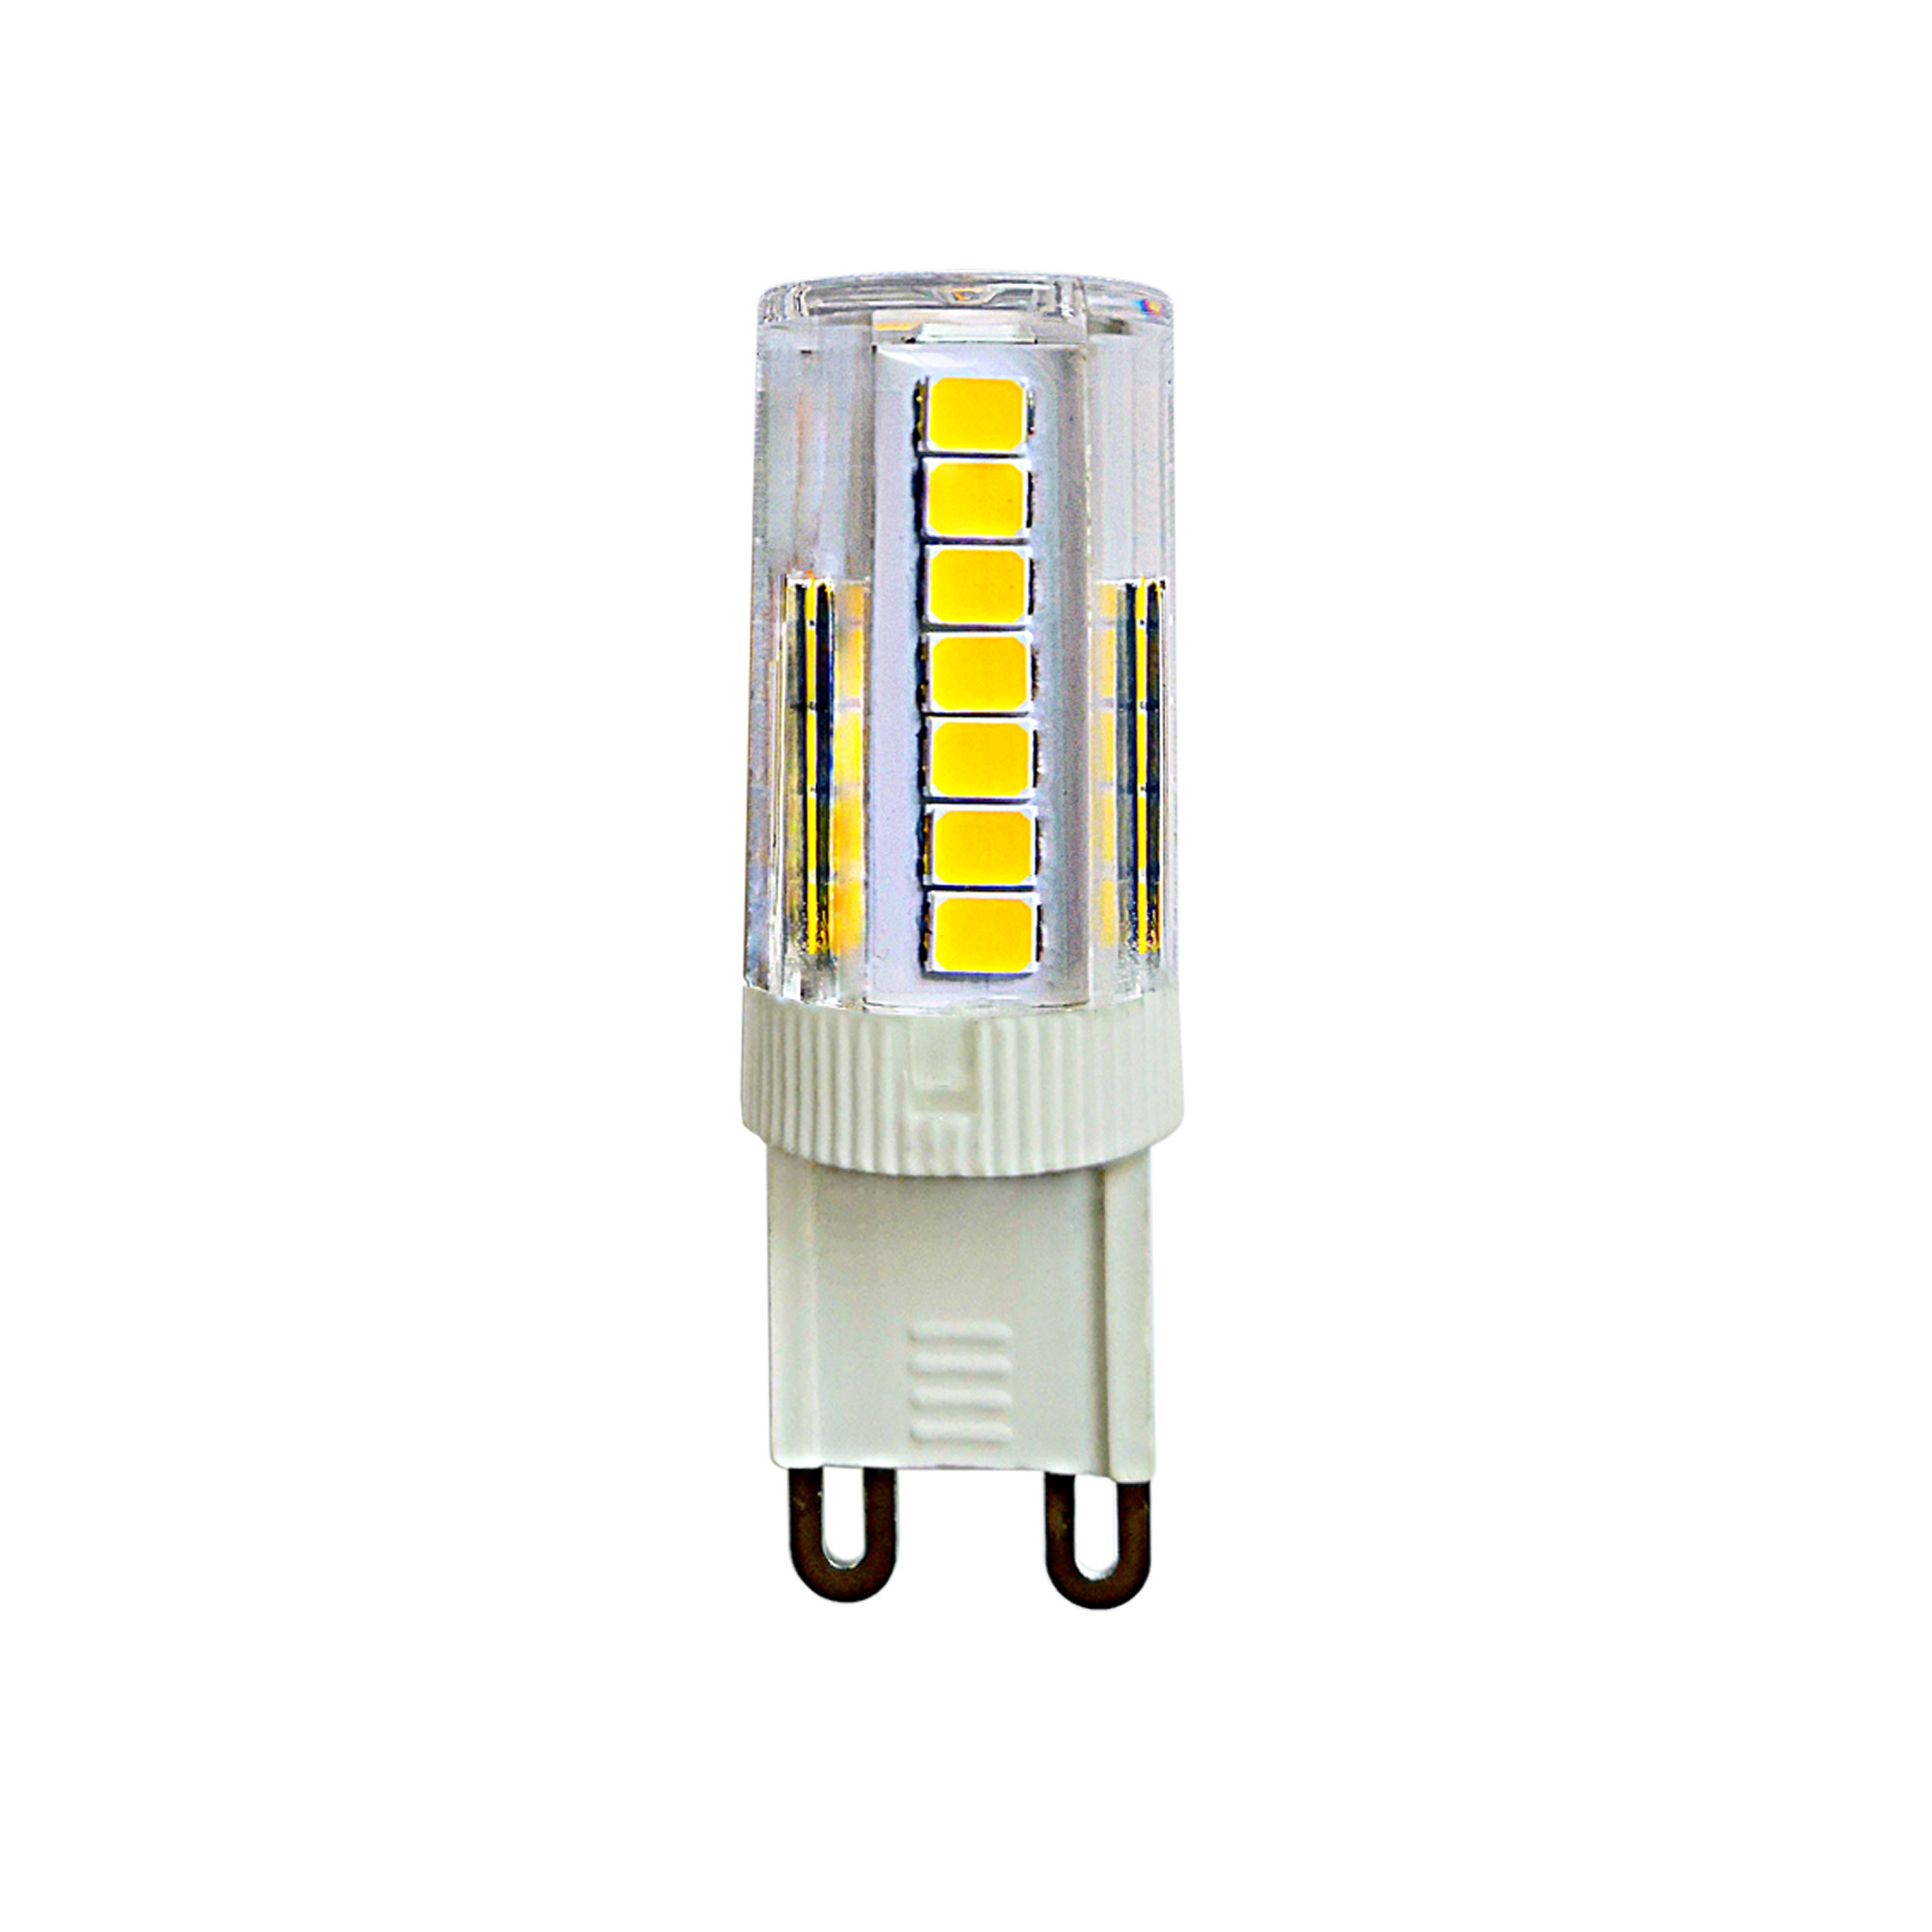 Лампа светодиодная G9 5 Вт капсула прозрачная 425 лм тёплый белый свет